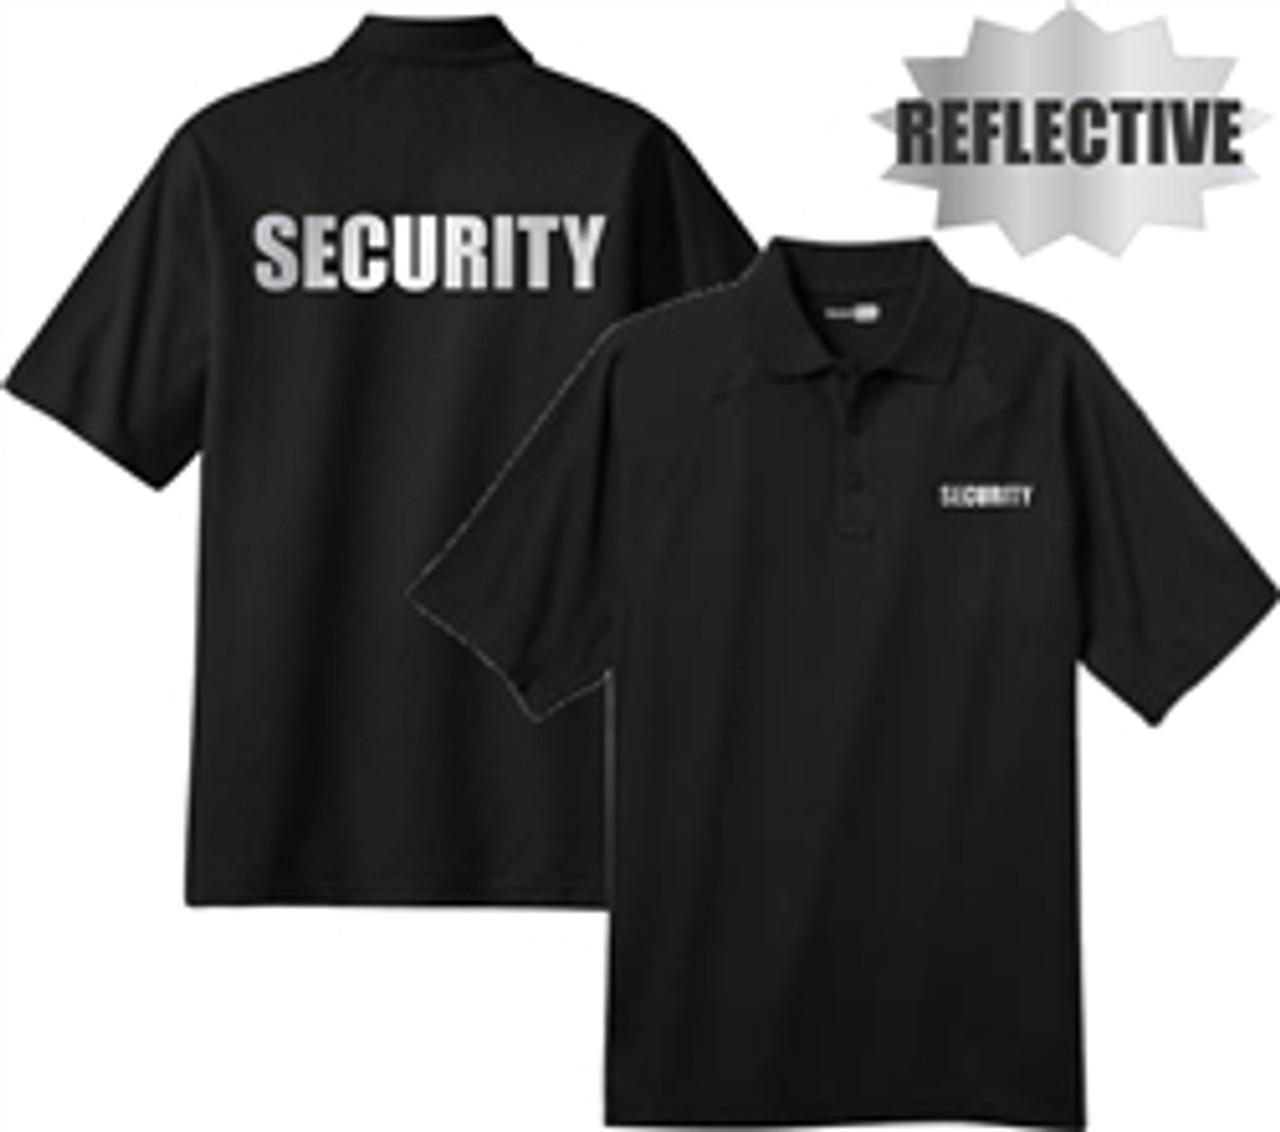 Security - Reflective Black Short Sleeve Tactical Polo